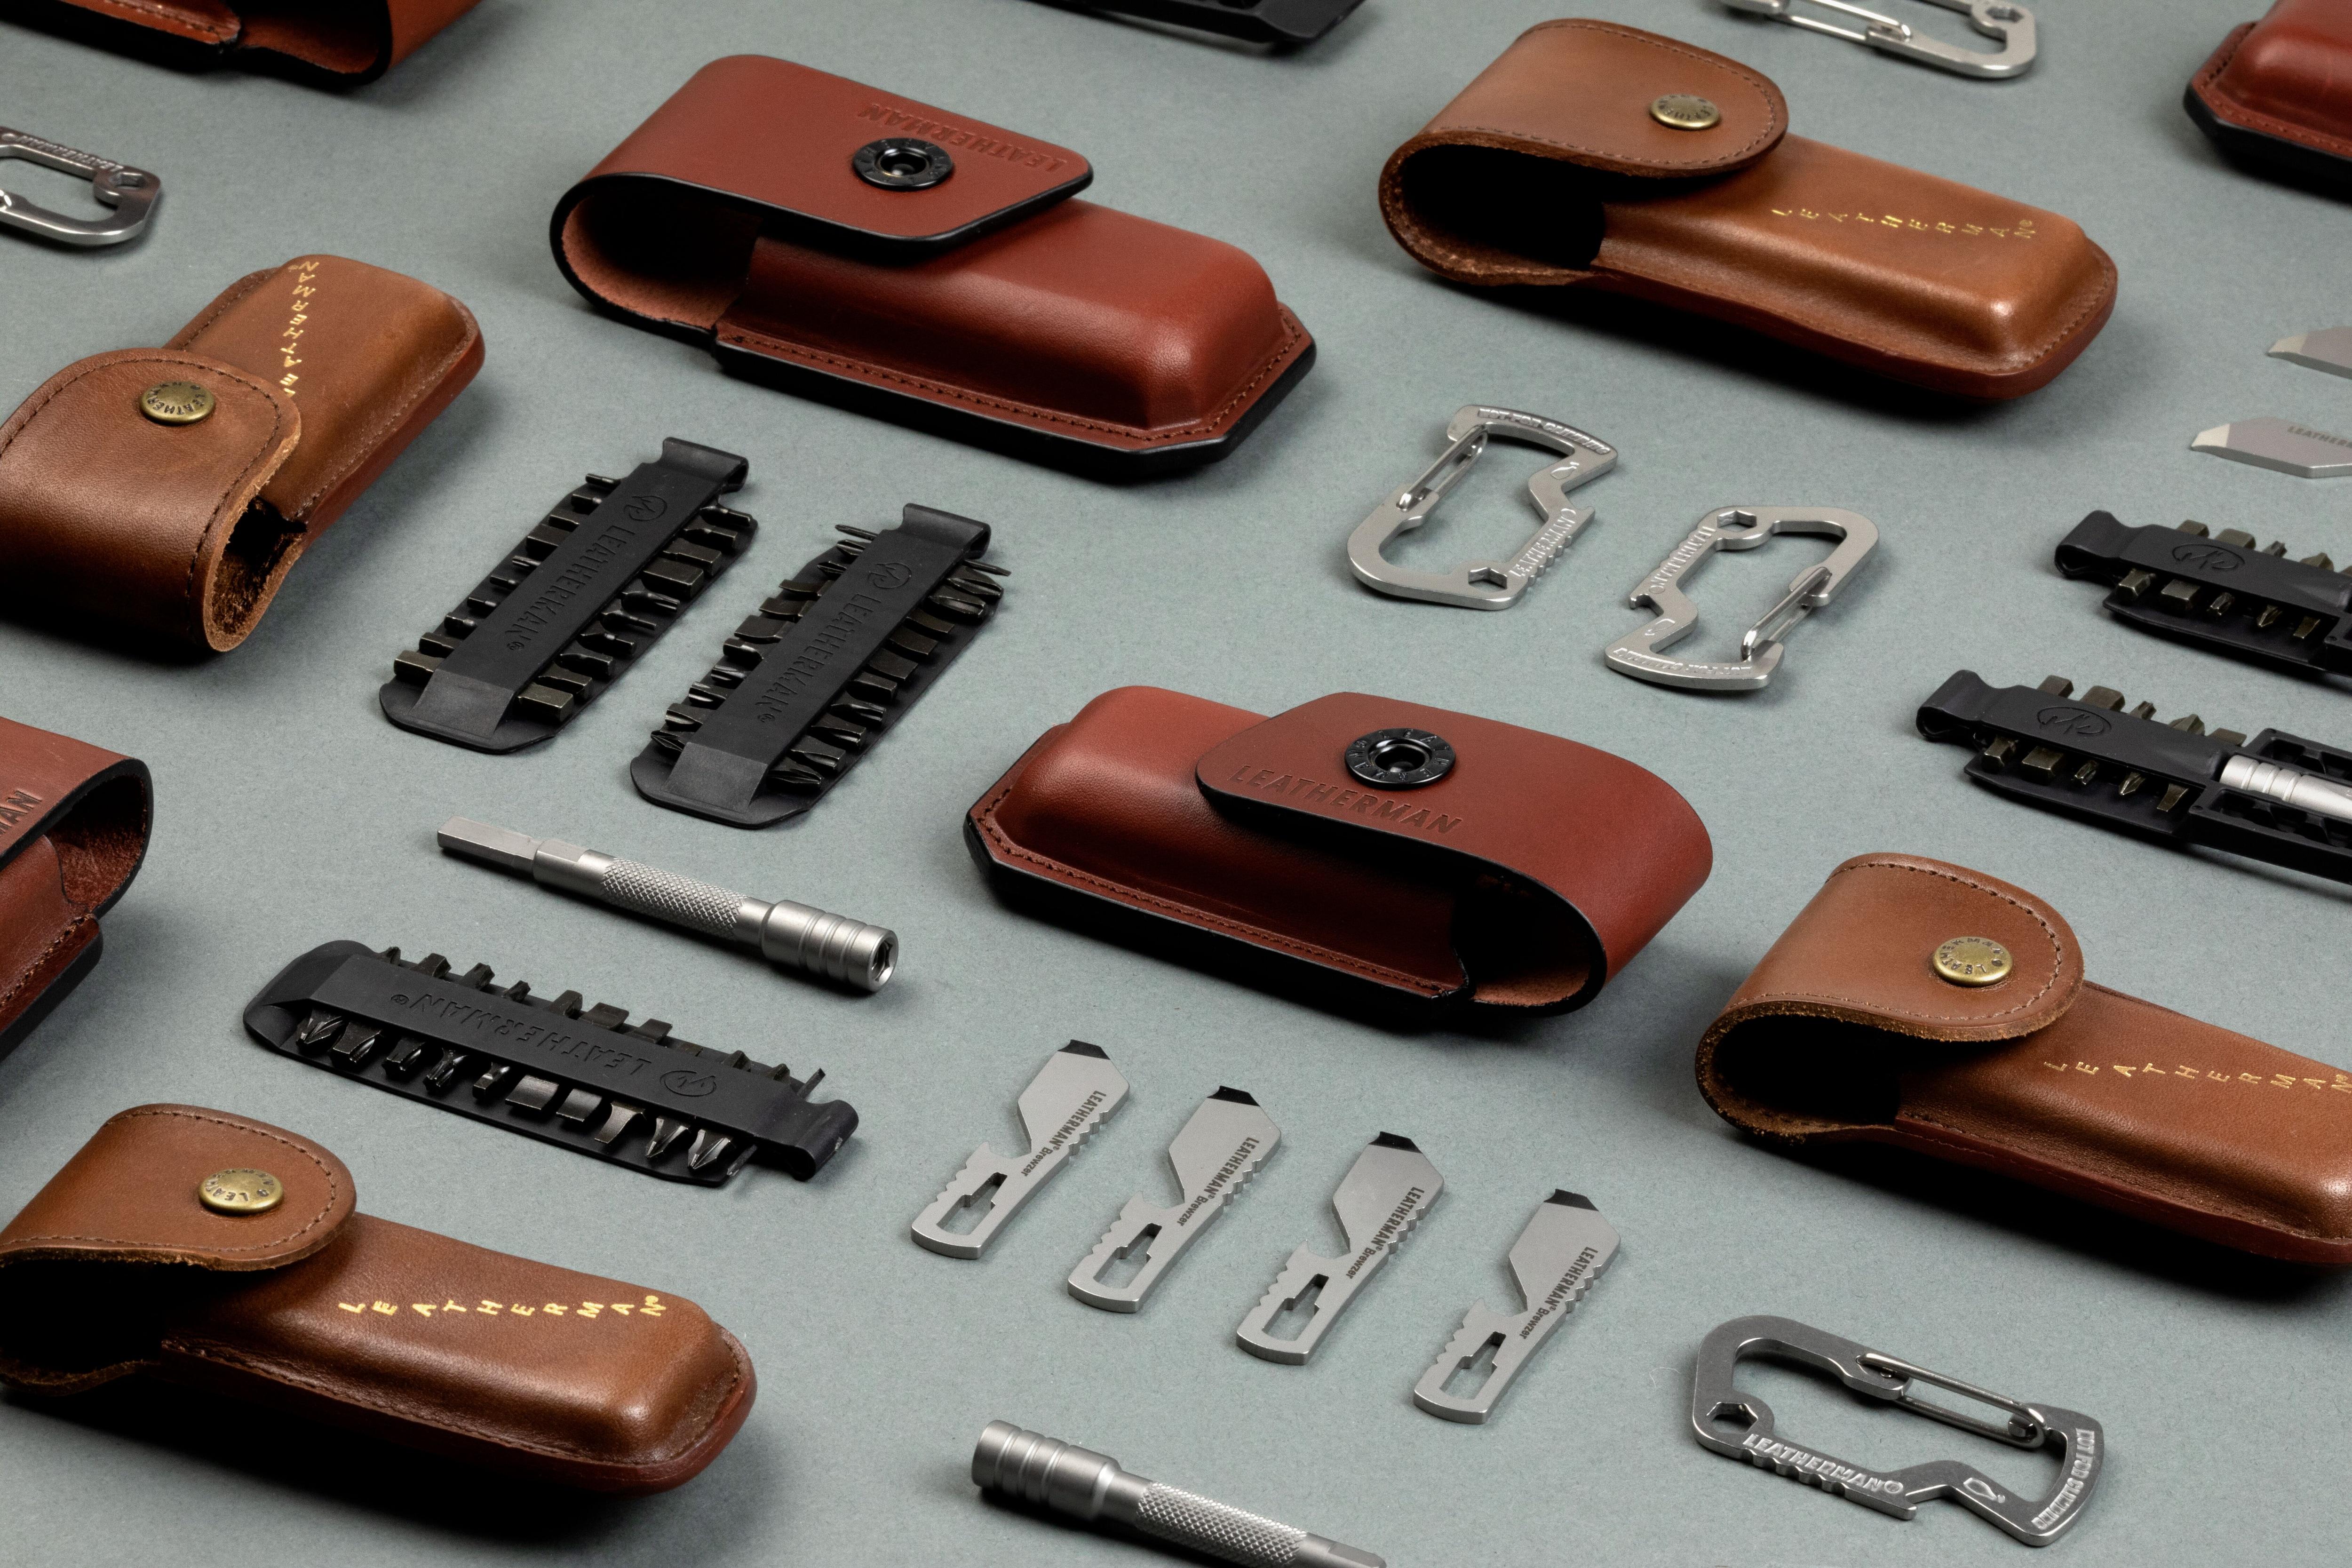 https://www.leathermanshop.no/pub_docs/files/Custom_Item_Images/Leatherman_Accessories_Laydown.jpg